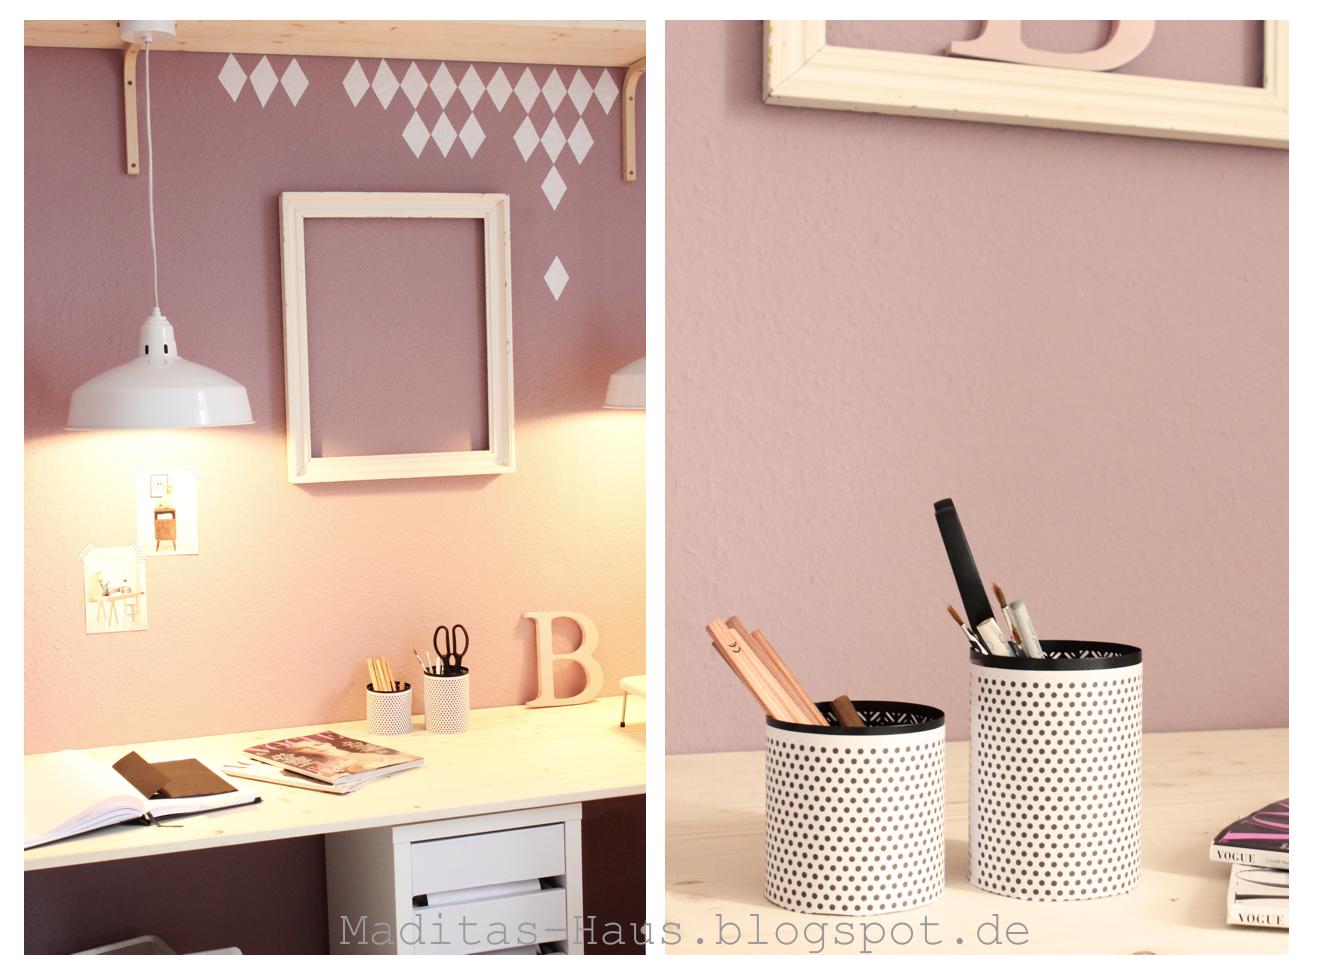 new workplace maditas haus lifestyle und interior blog. Black Bedroom Furniture Sets. Home Design Ideas